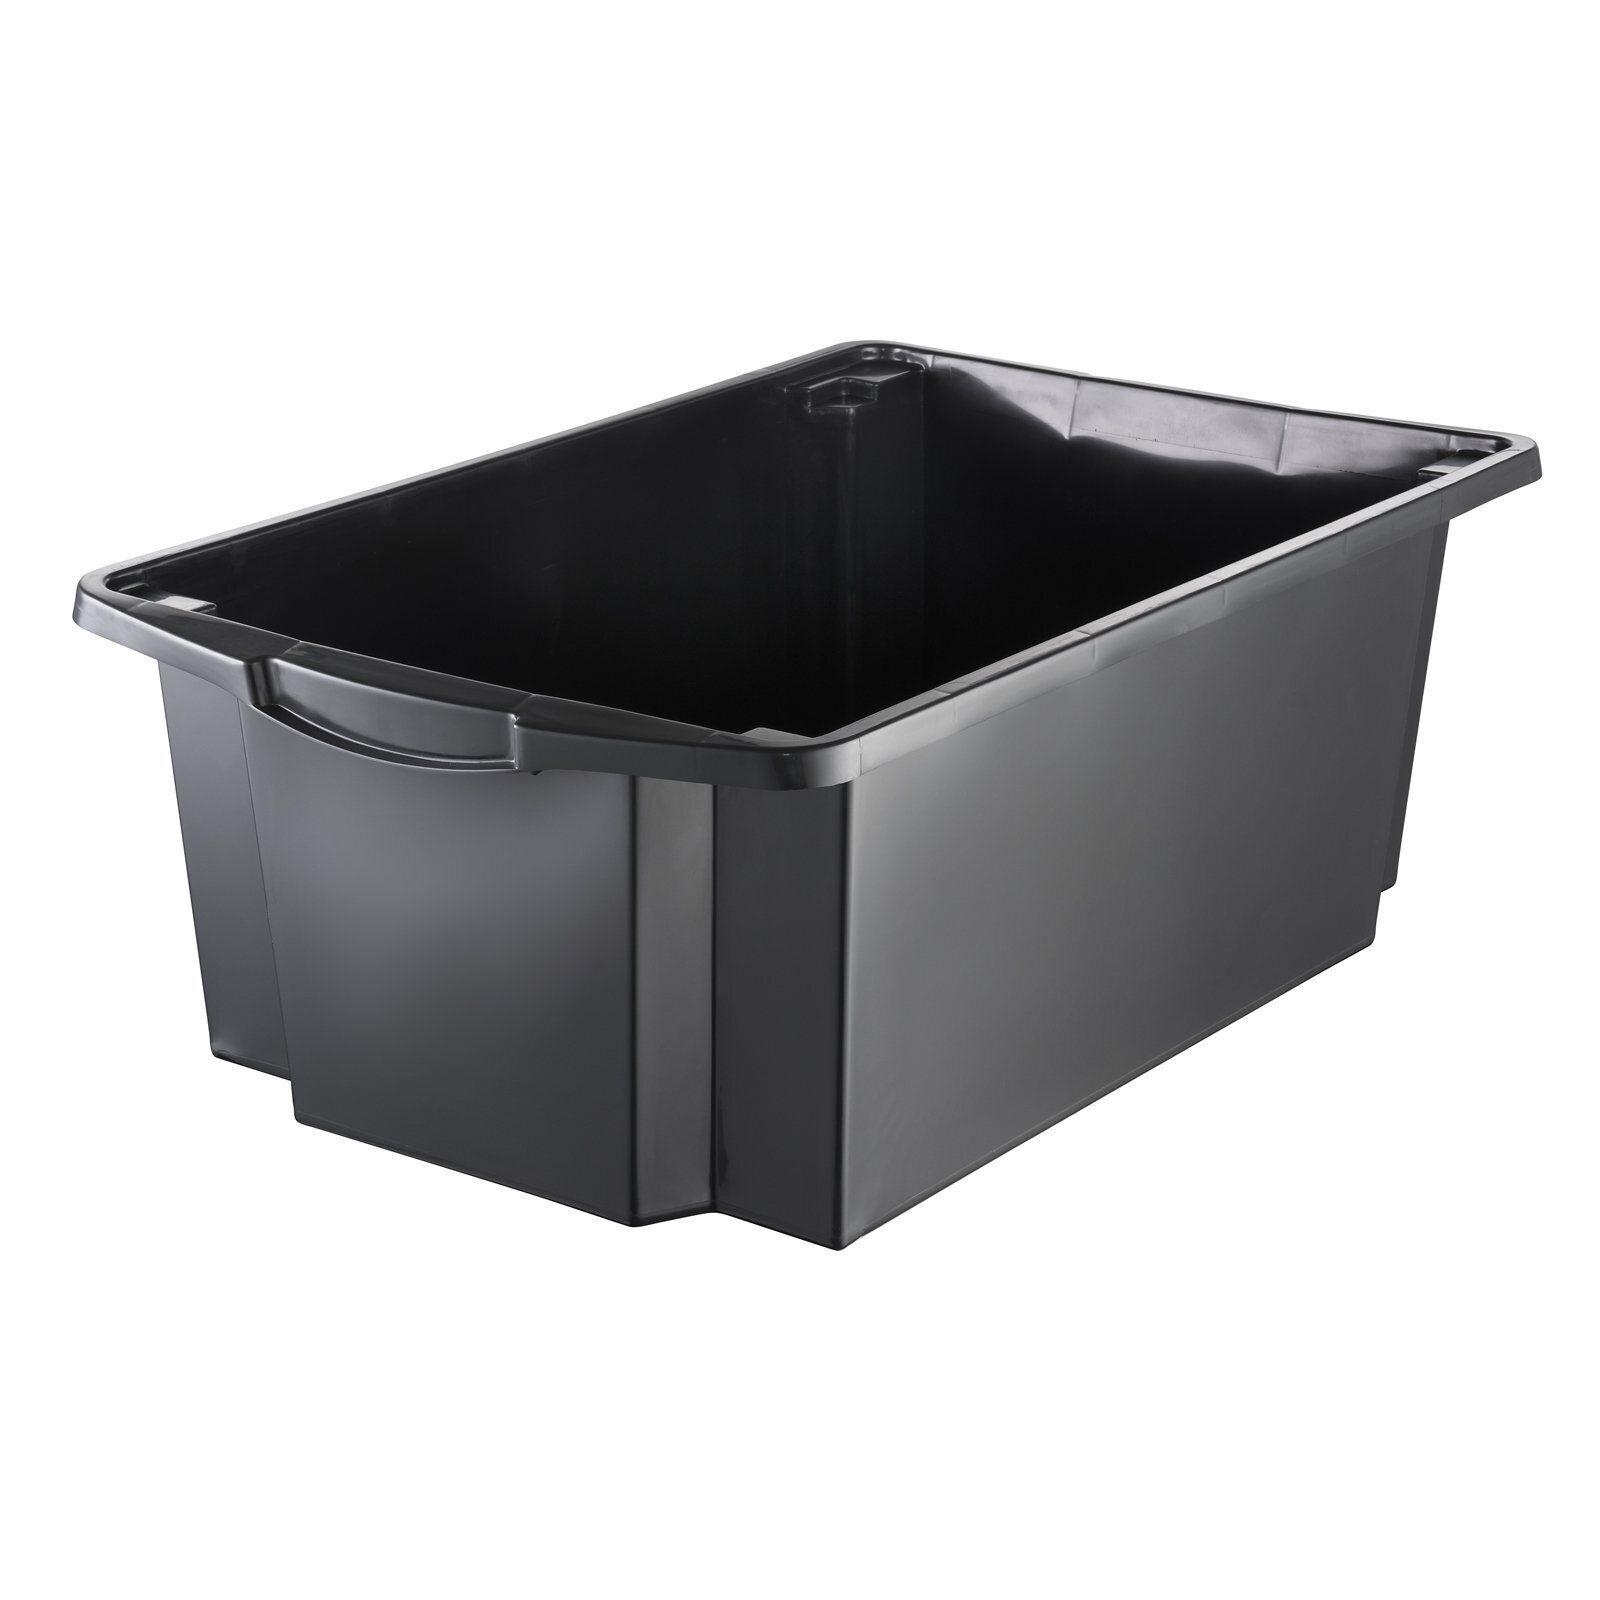 Inabox Storage Crate - 73L